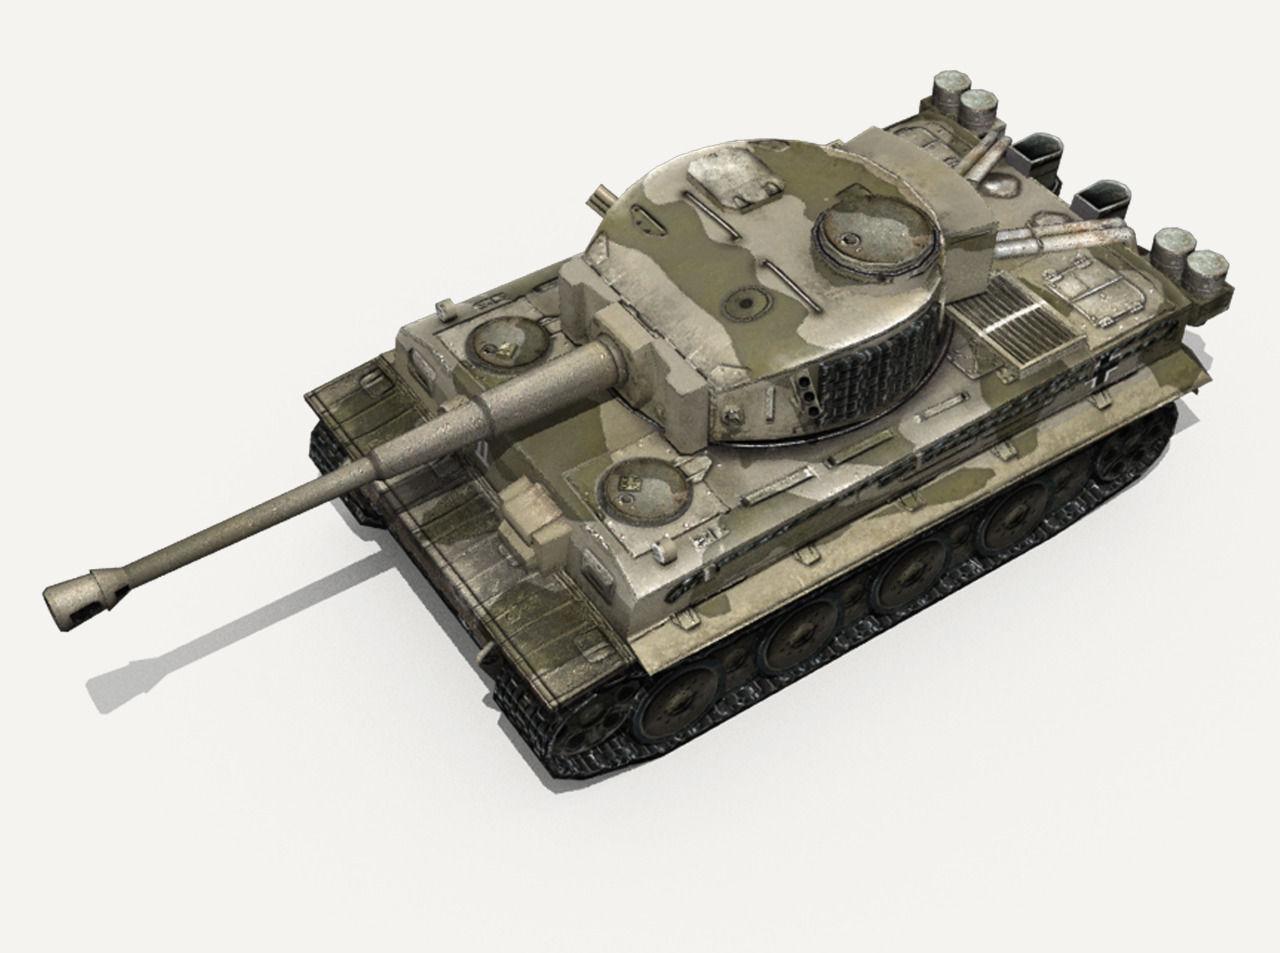 D model panzer vi tiger german heavy tank vr ar low